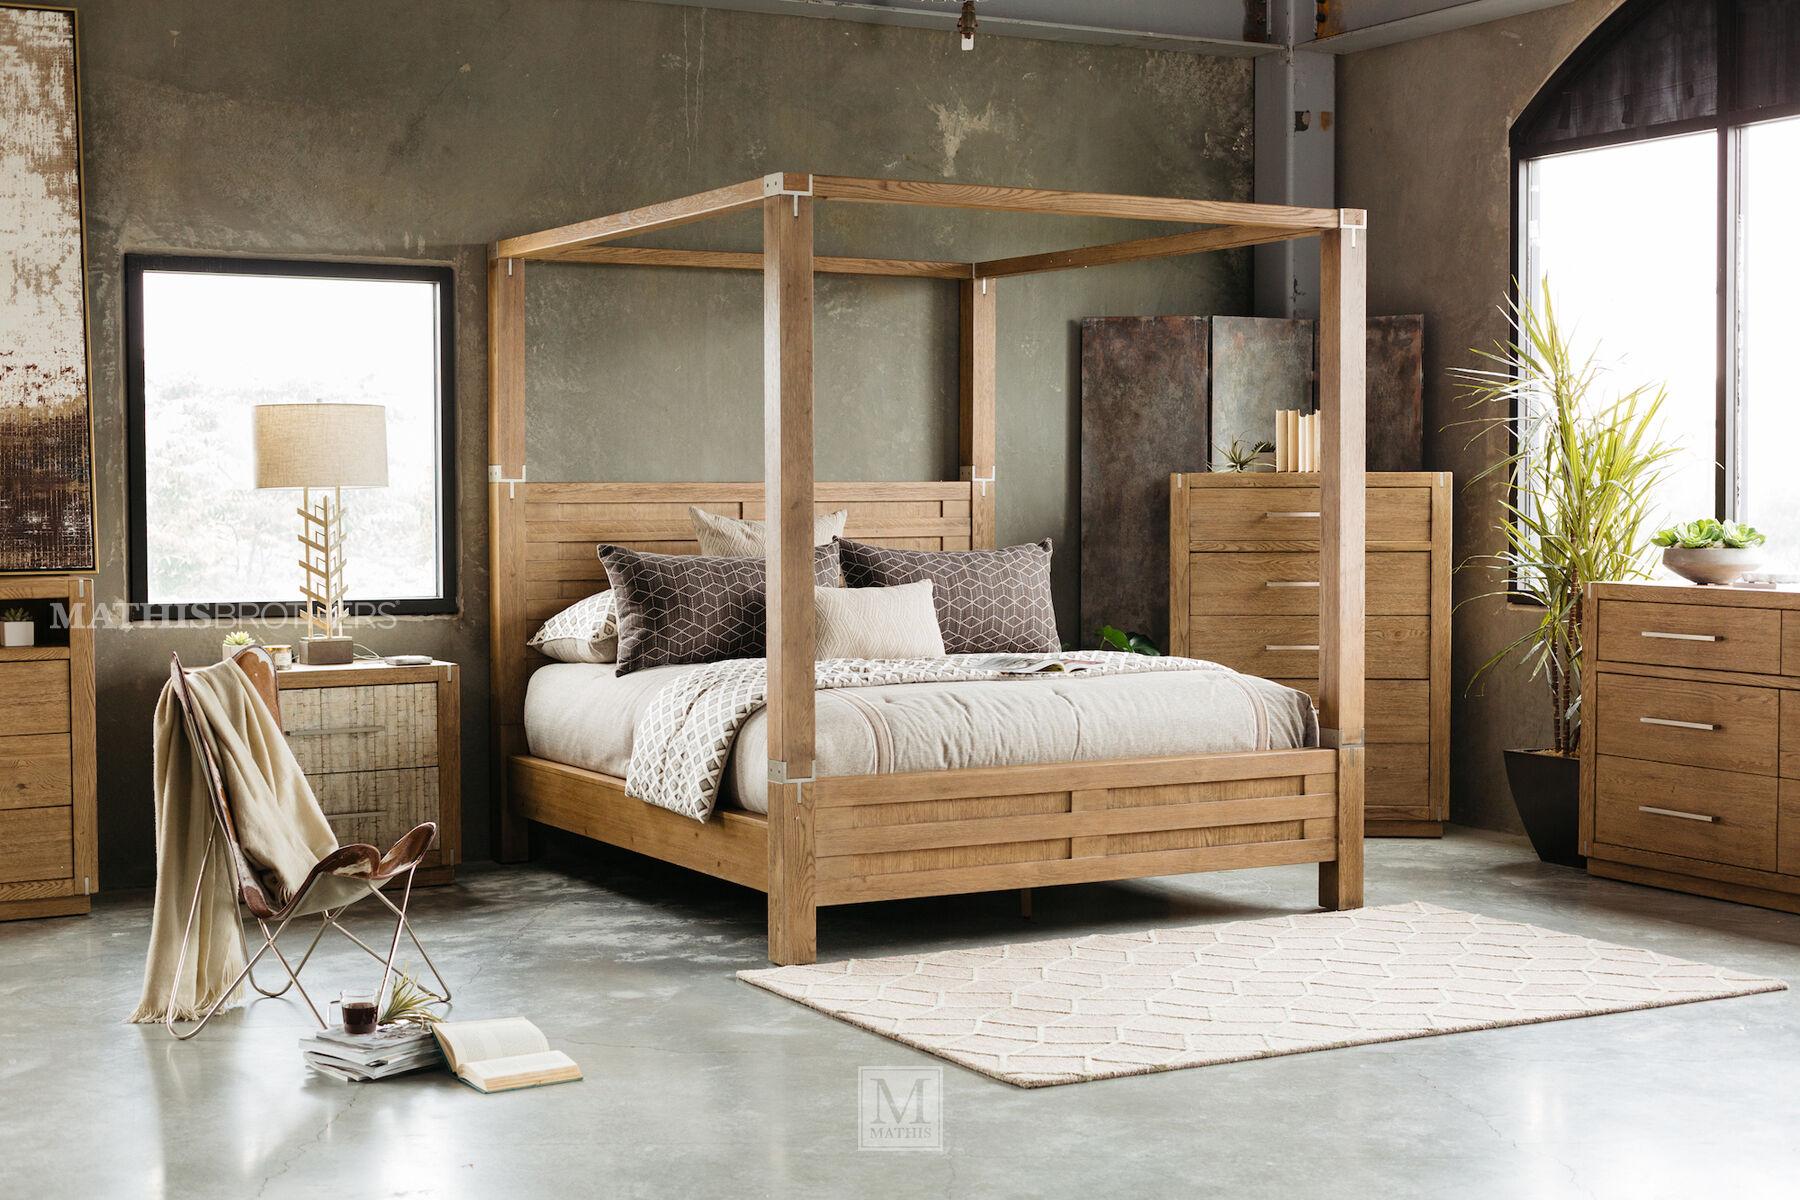 Pulaski Corridor Queen Canopy Bed Pulaski Corridor Queen Canopy Bed & Bedroom Furniture Stores | Mathis Brothers